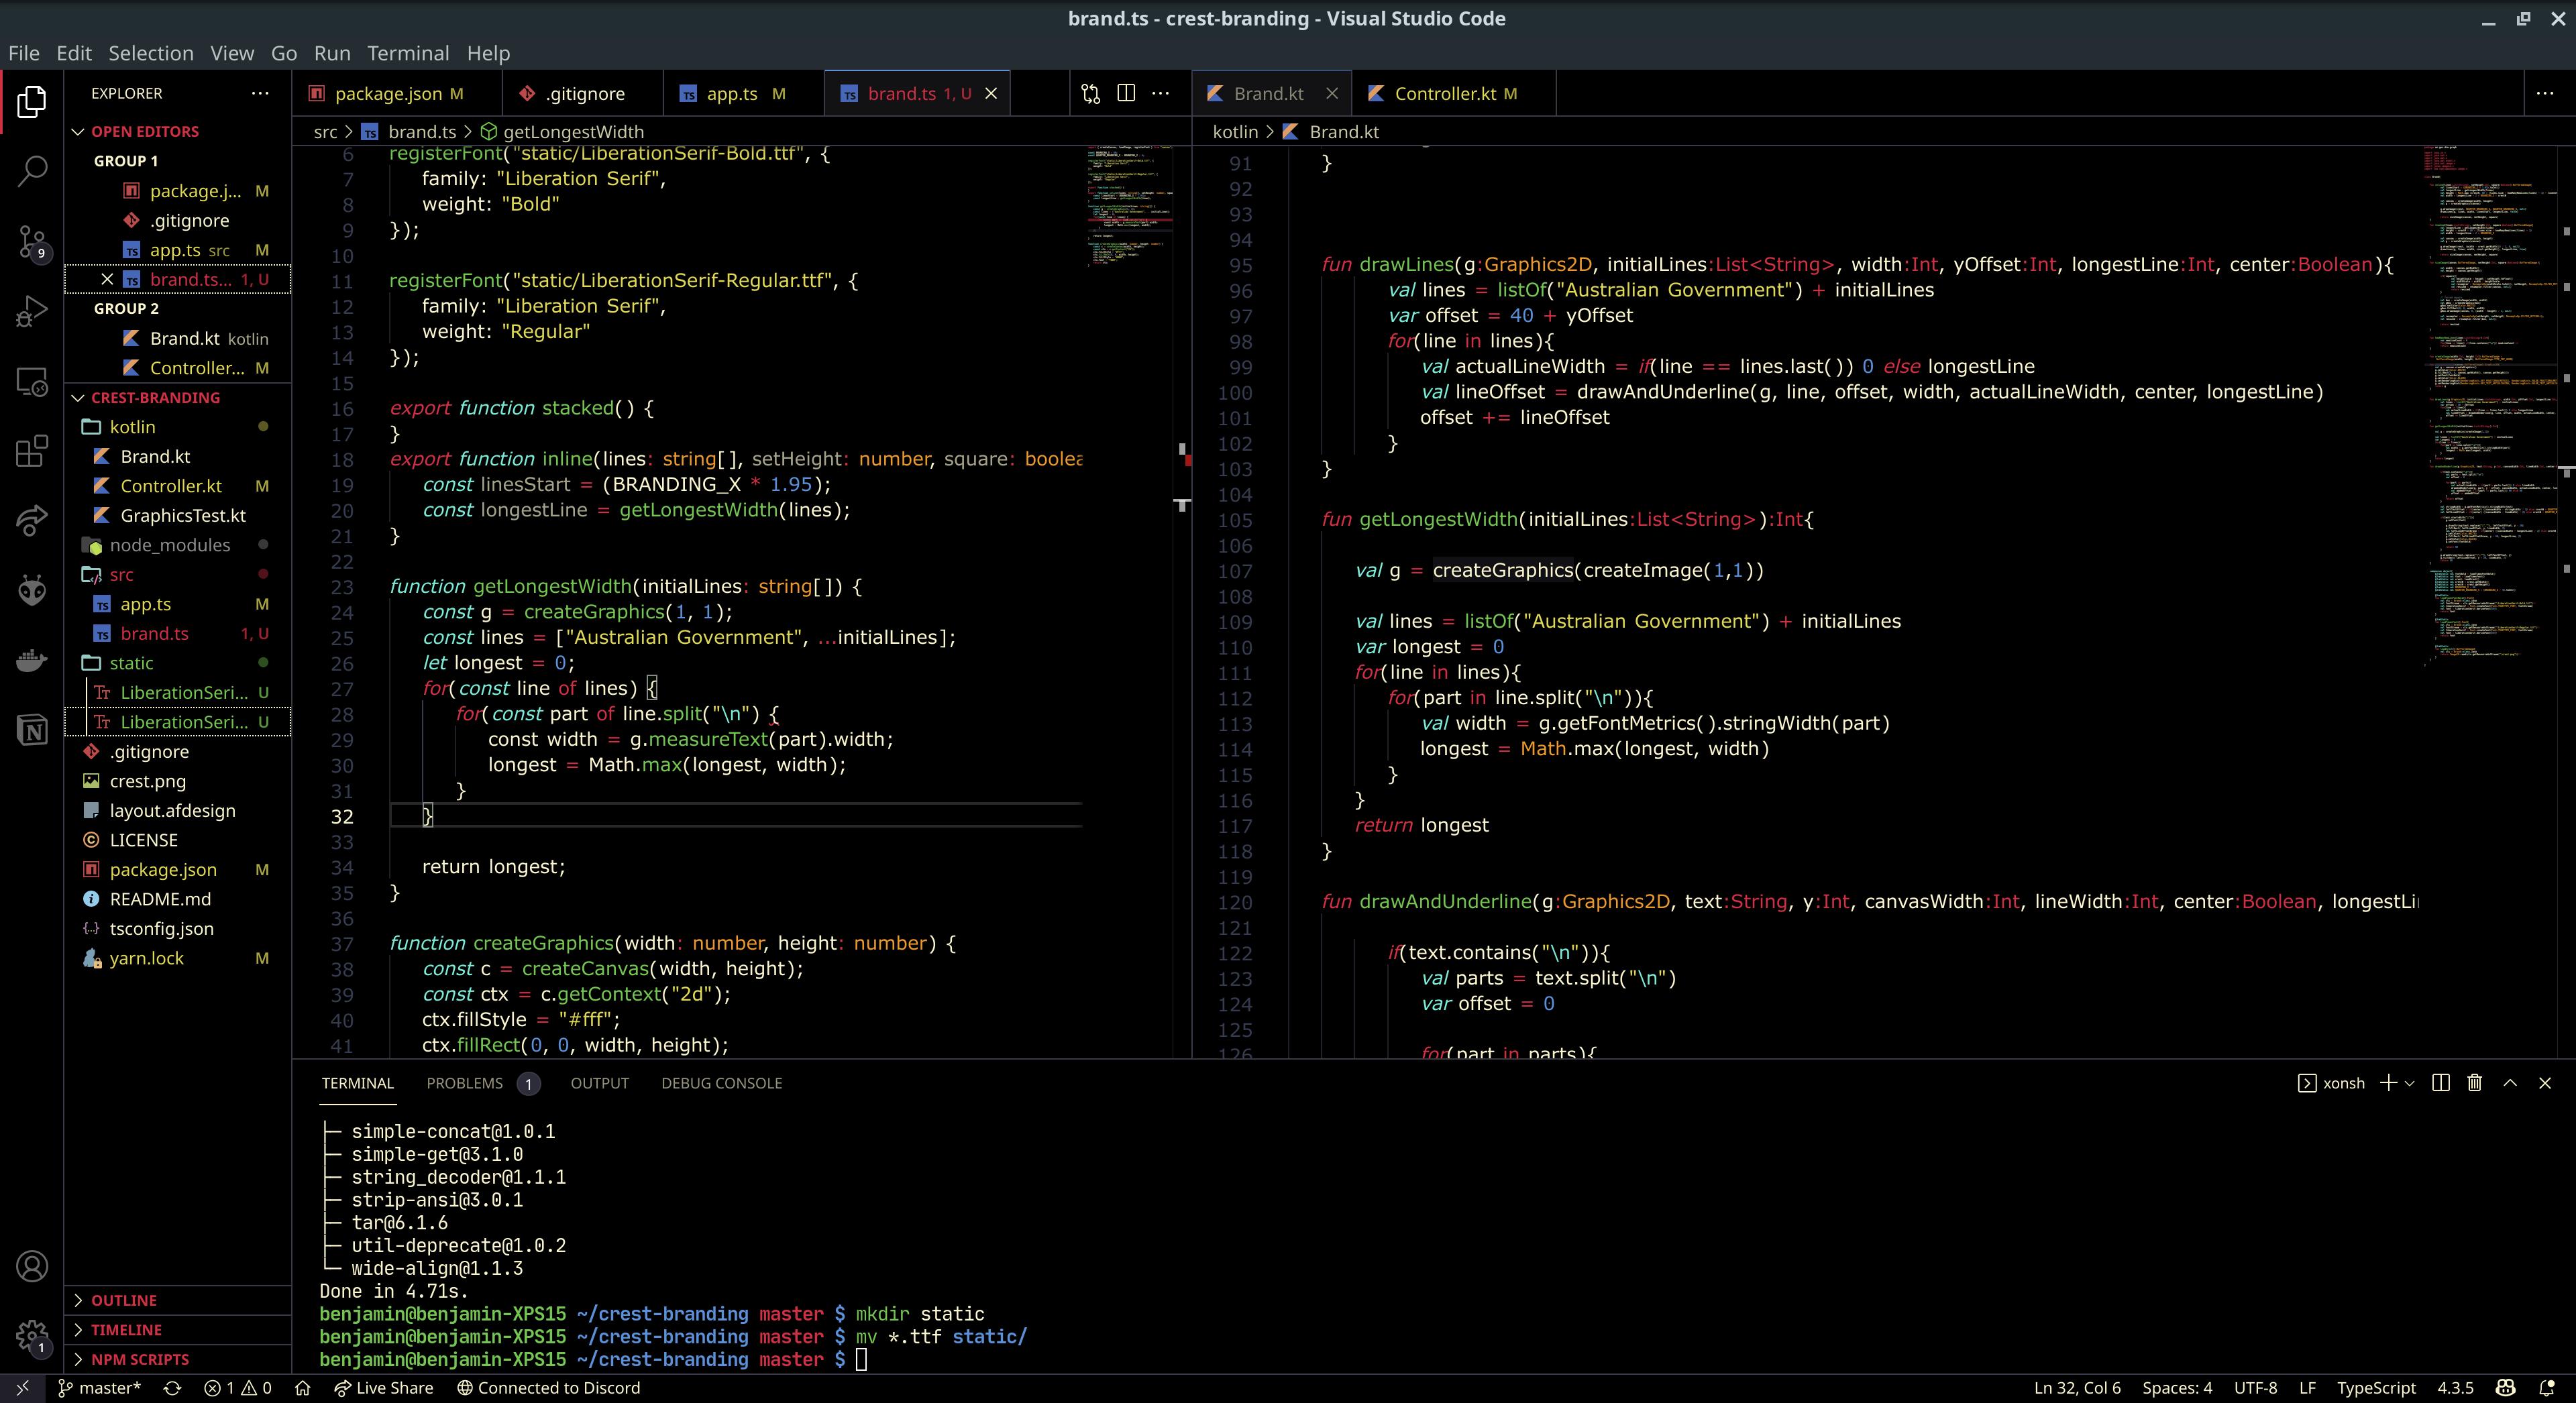 https://cloud-adiw1oc62-hack-club-bot.vercel.app/0image.png